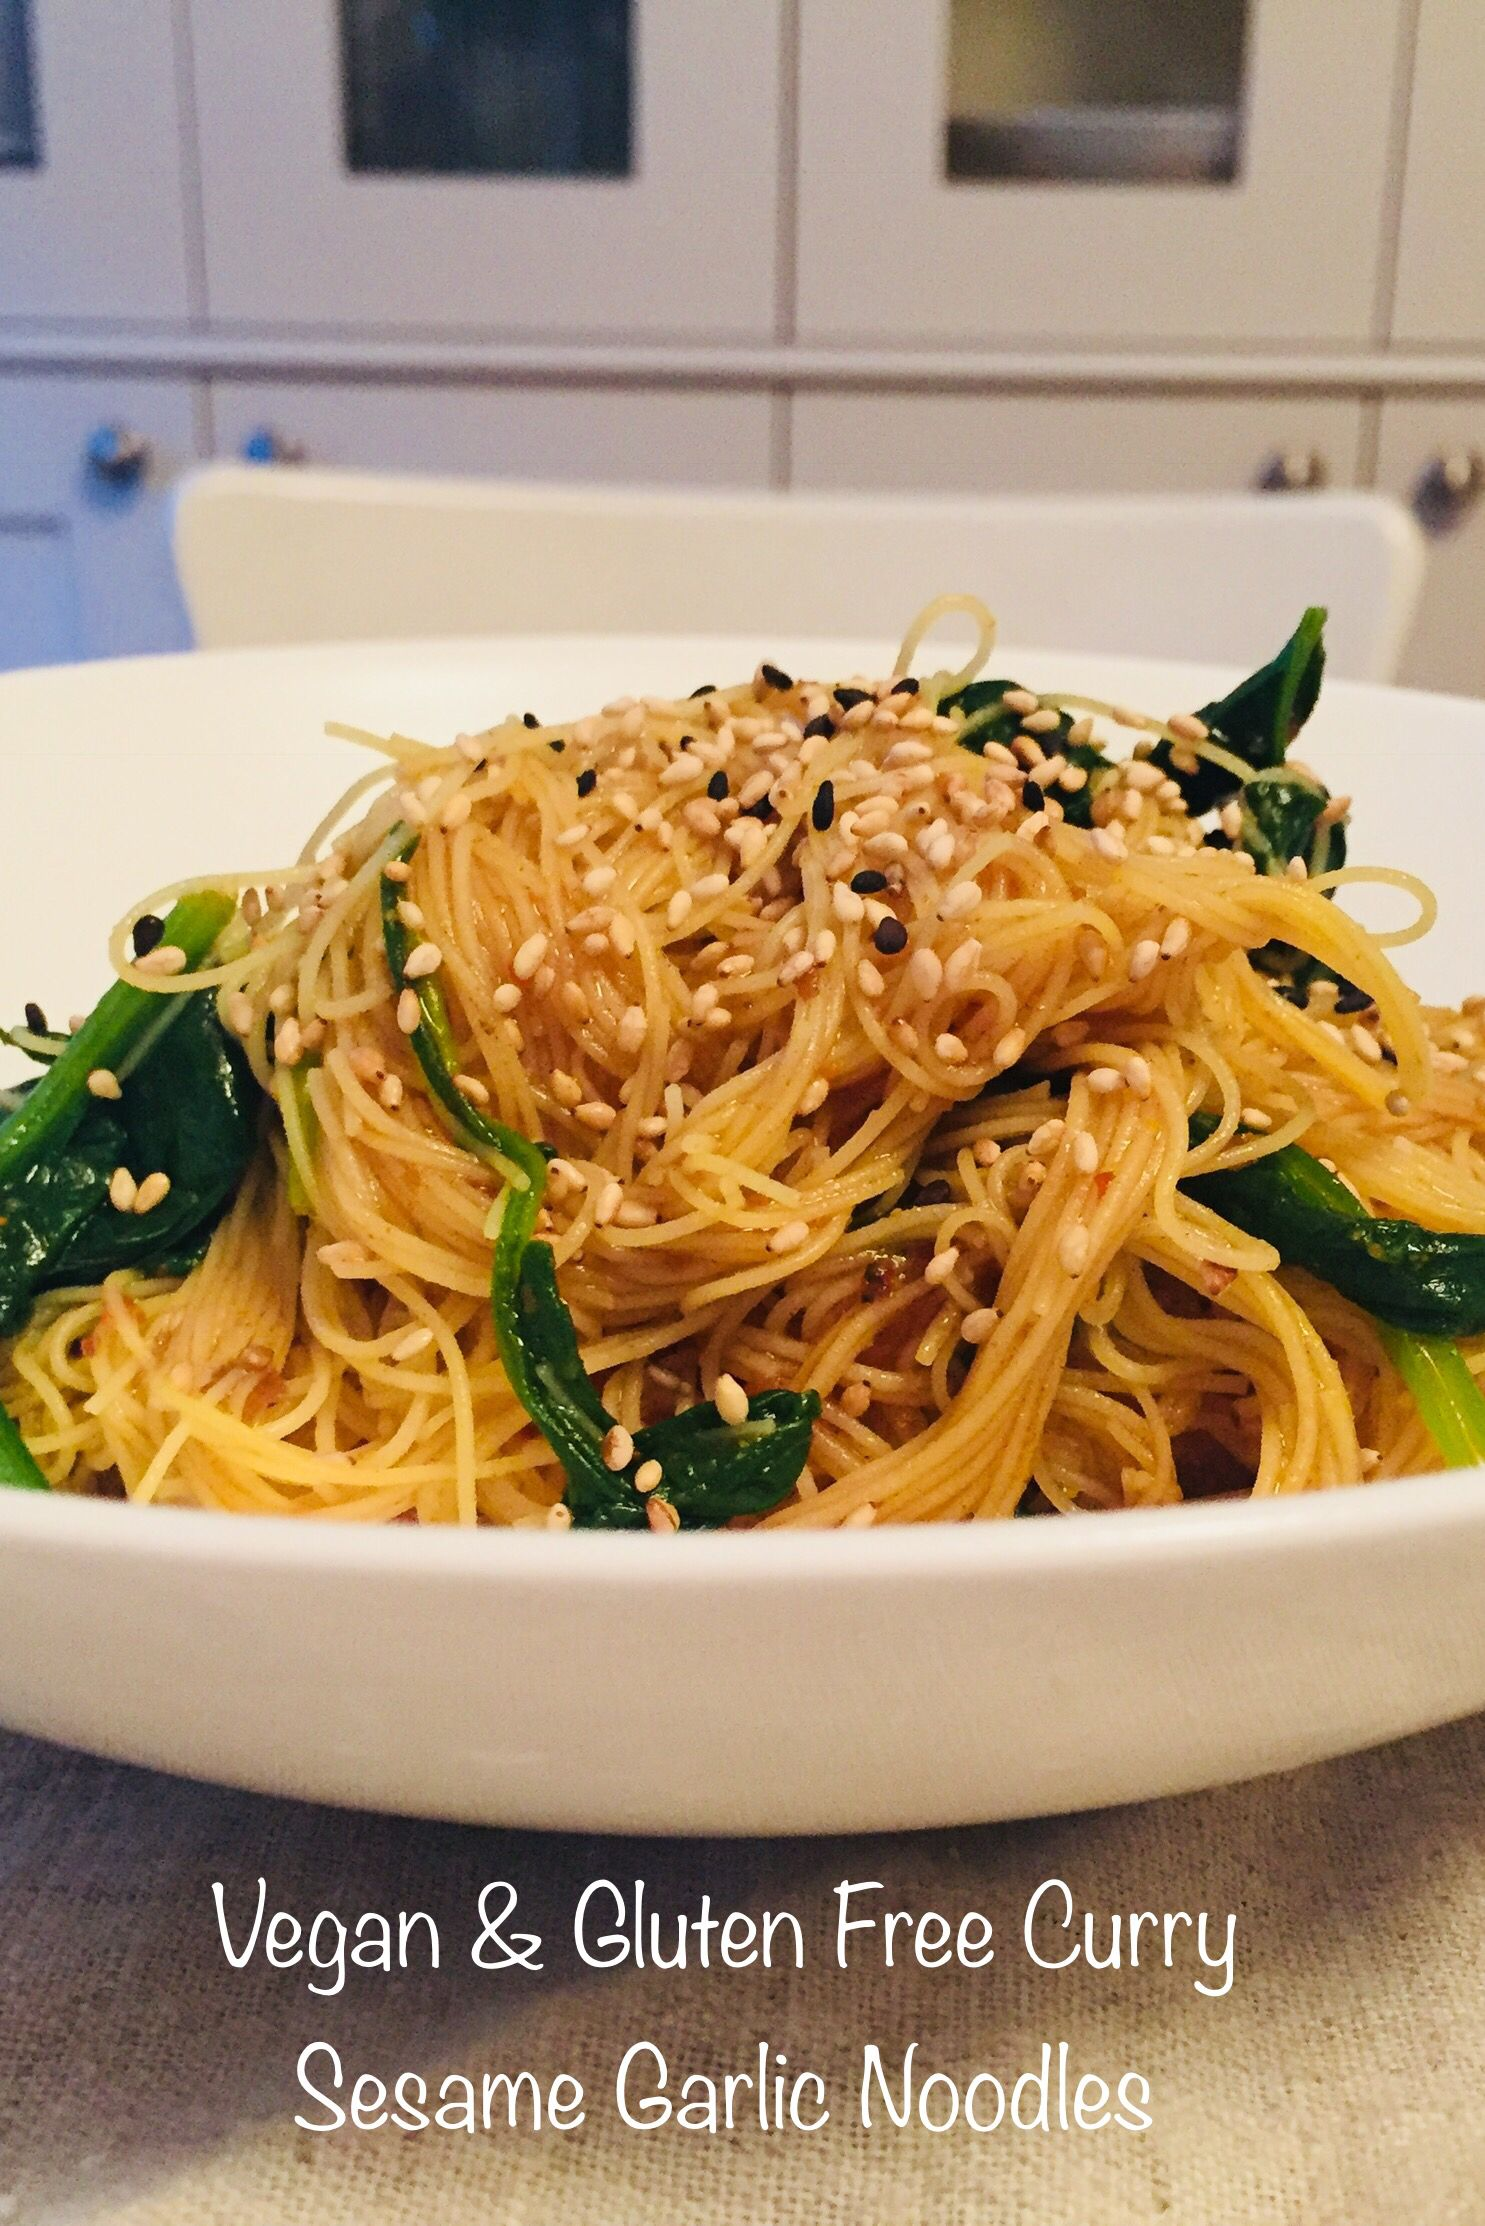 This Healthy Vegan Gluten Free Curry Sesame Garlic Brown